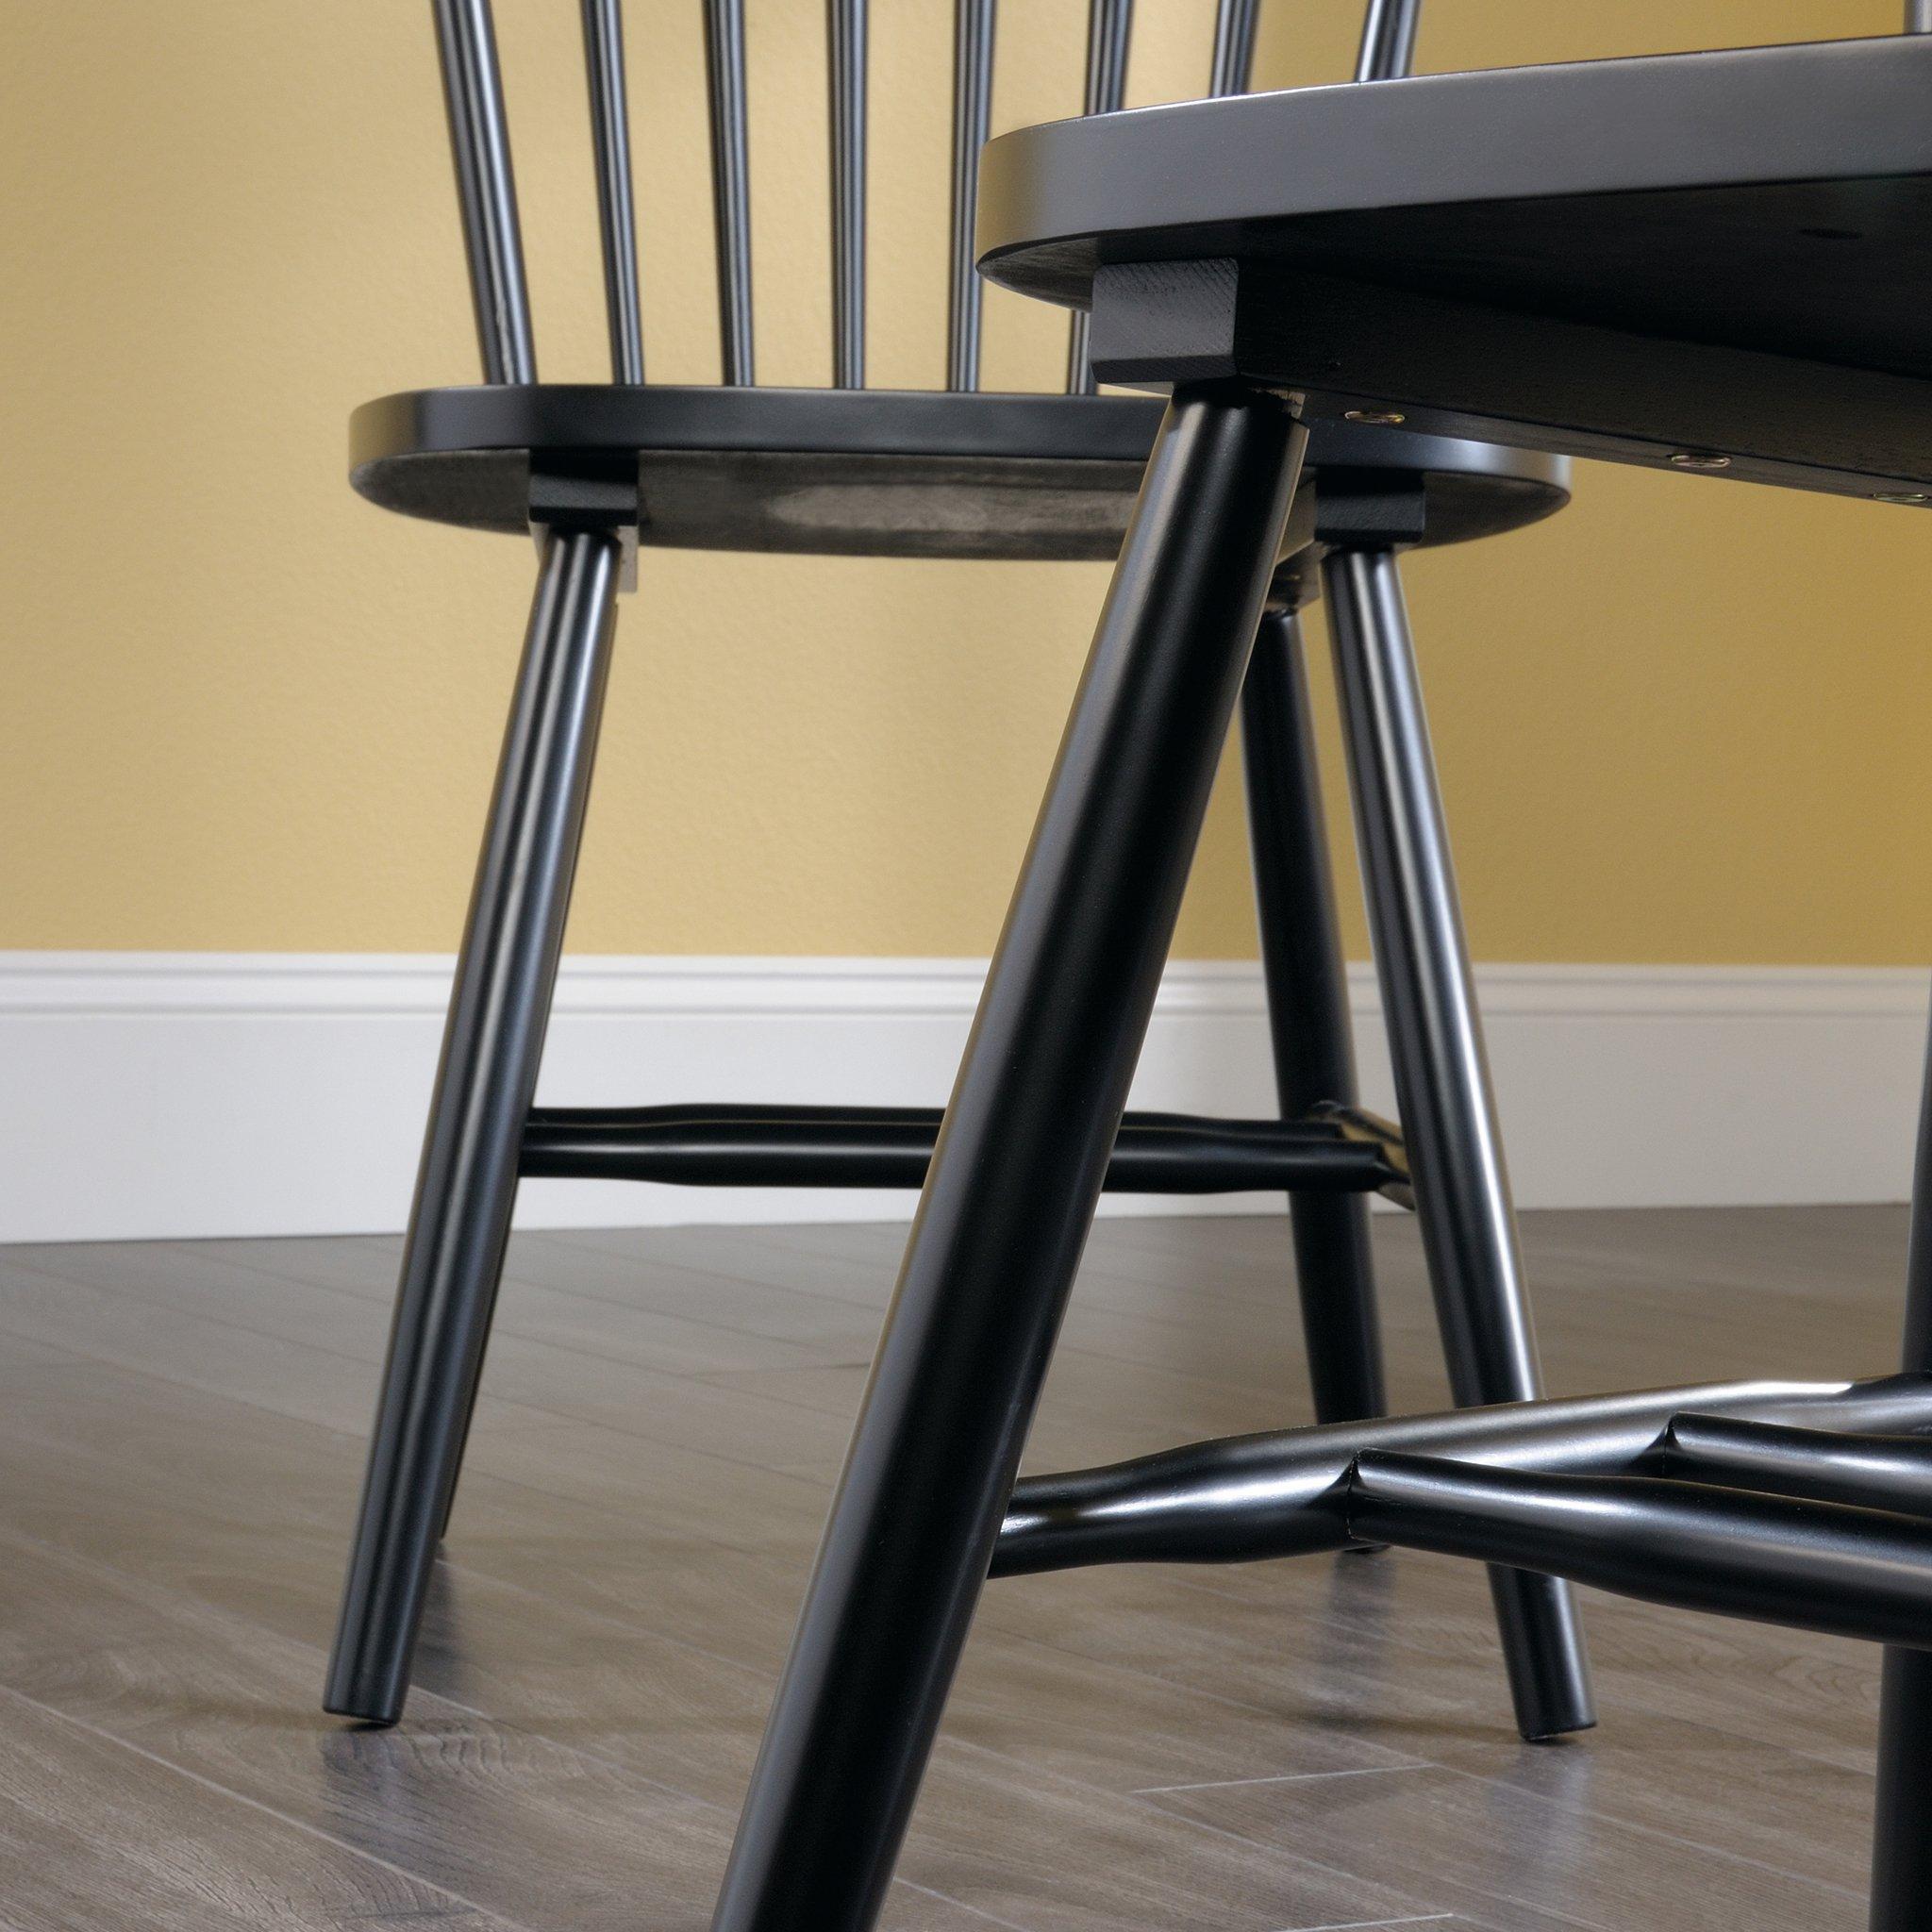 Sauder 418892 New Grange Spindle Back Chairs, L: 20.47'' x W: 21.26'' x H: 36.22'', Black finish by Sauder (Image #6)